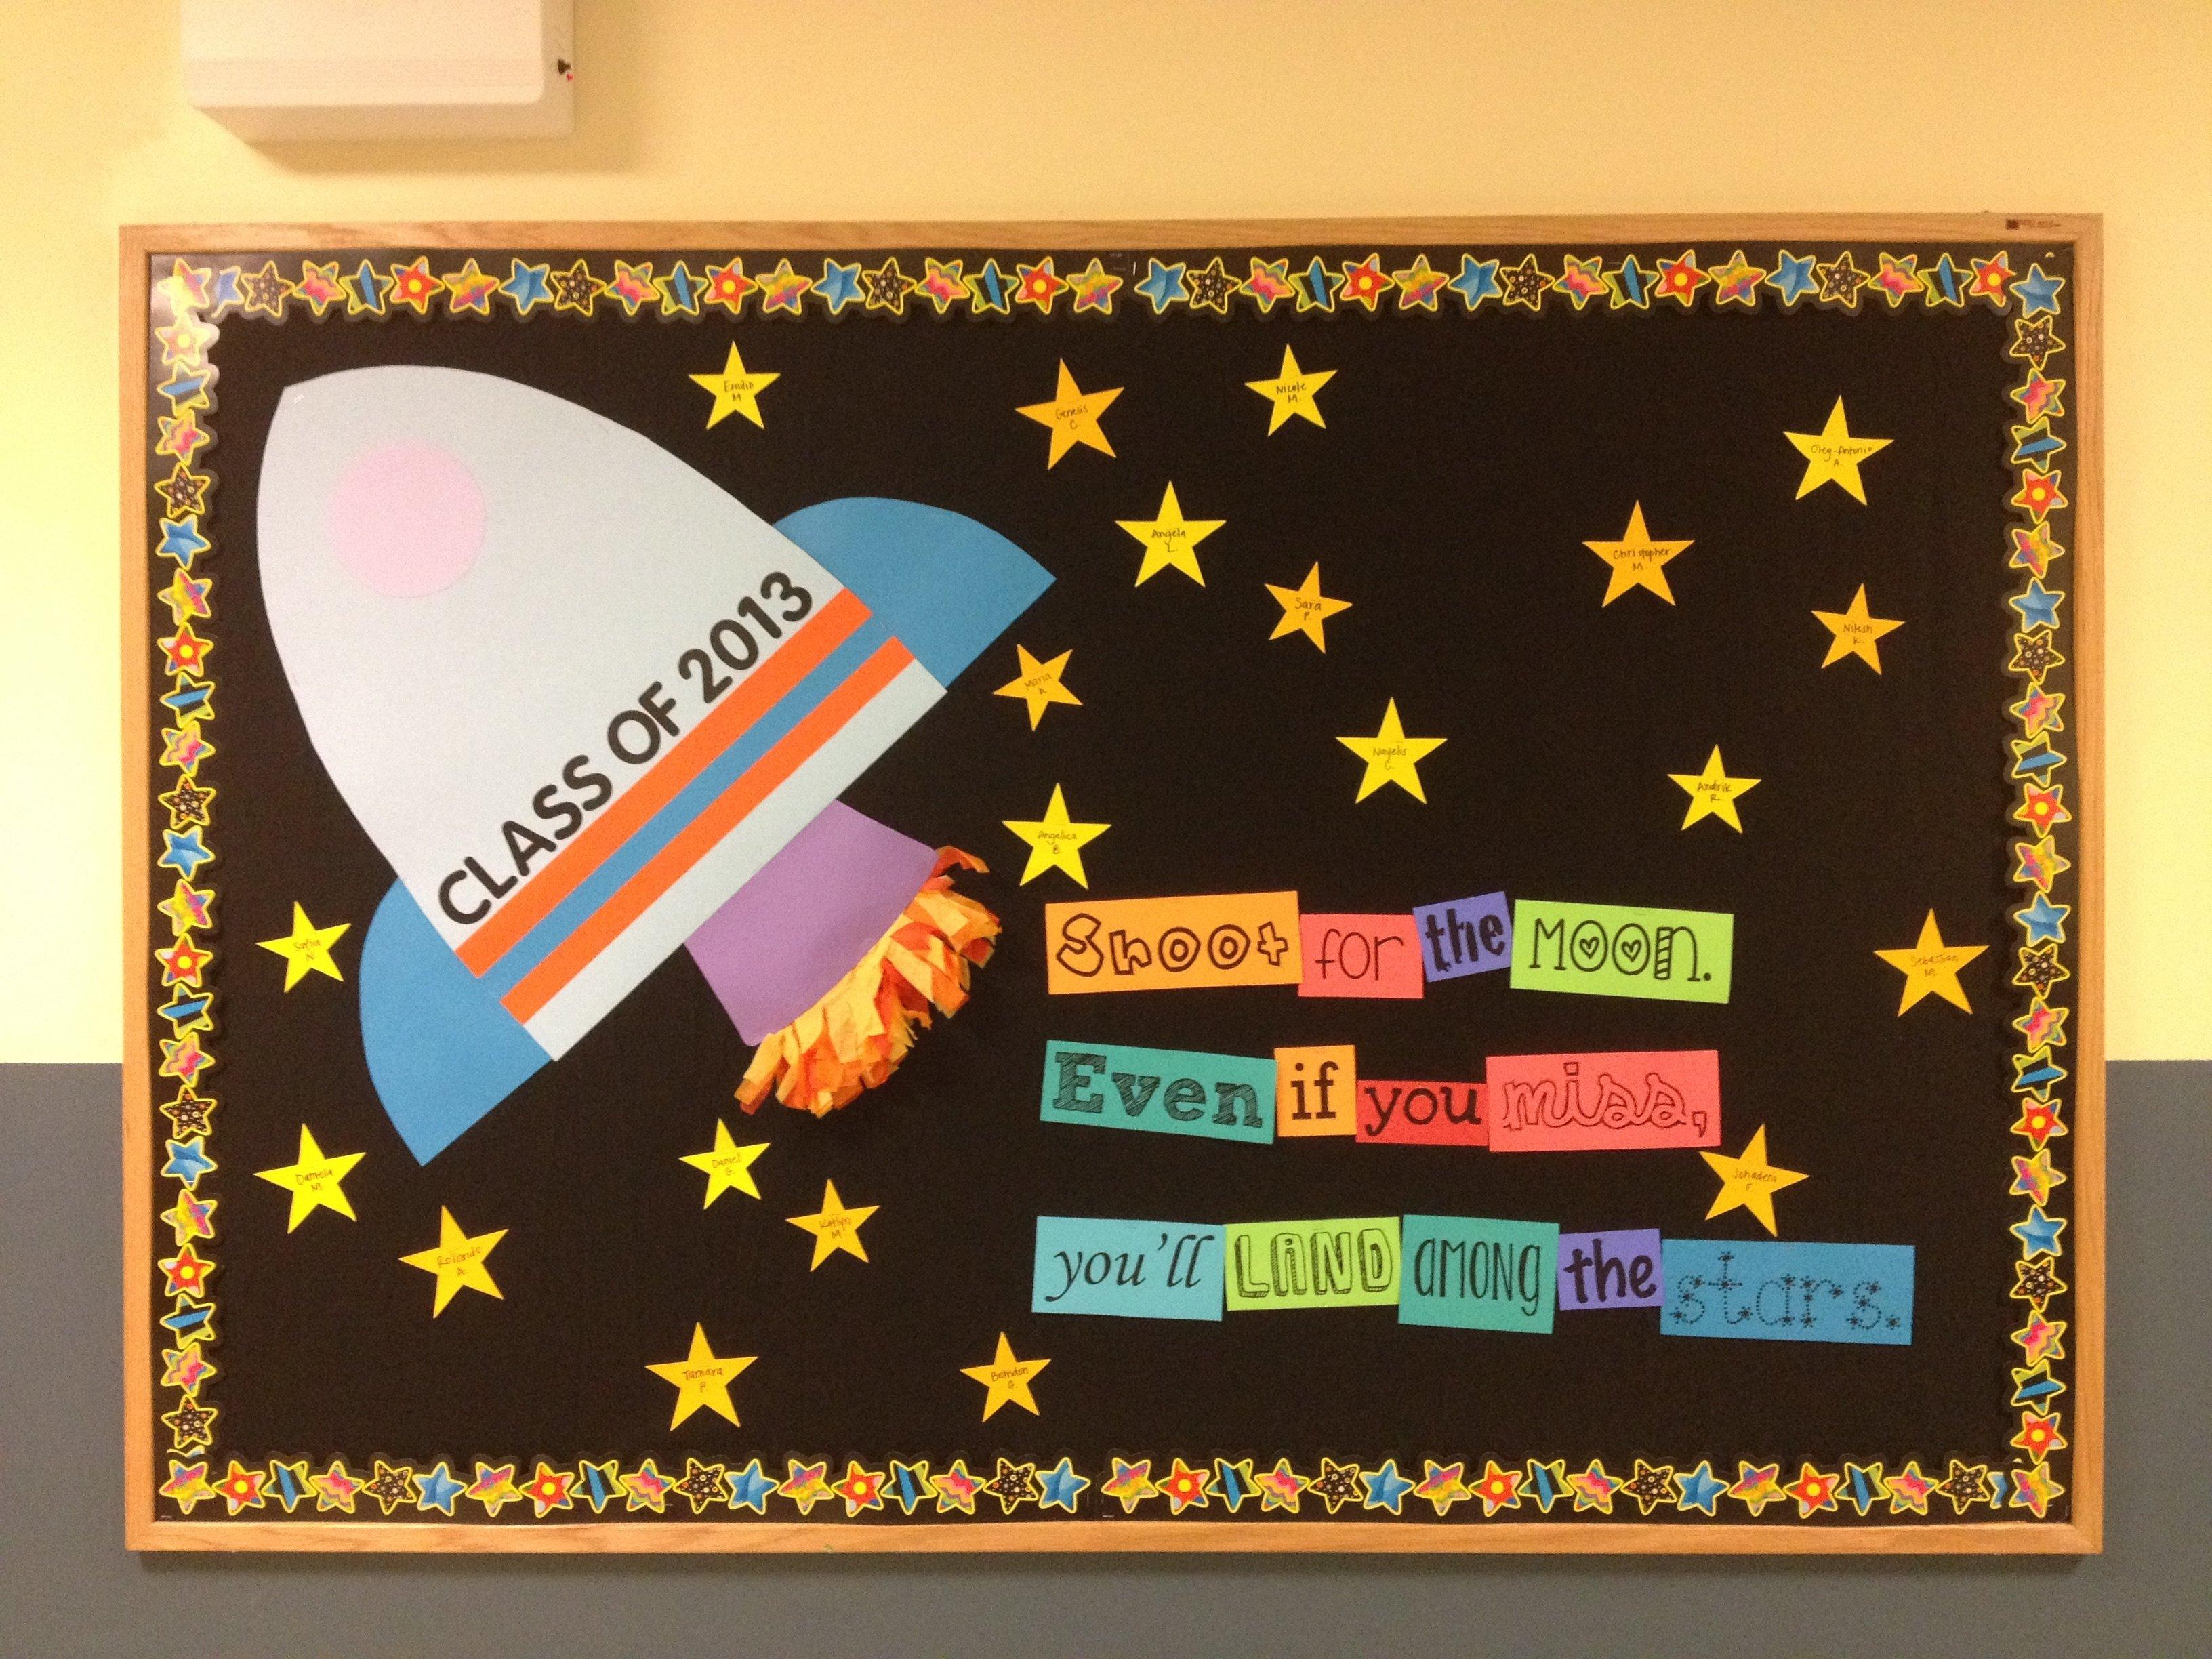 10 Wonderful Beginning Of The Year Bulletin Board Ideas shoot for the moon bulletin board 5th grade back to school 8 2020